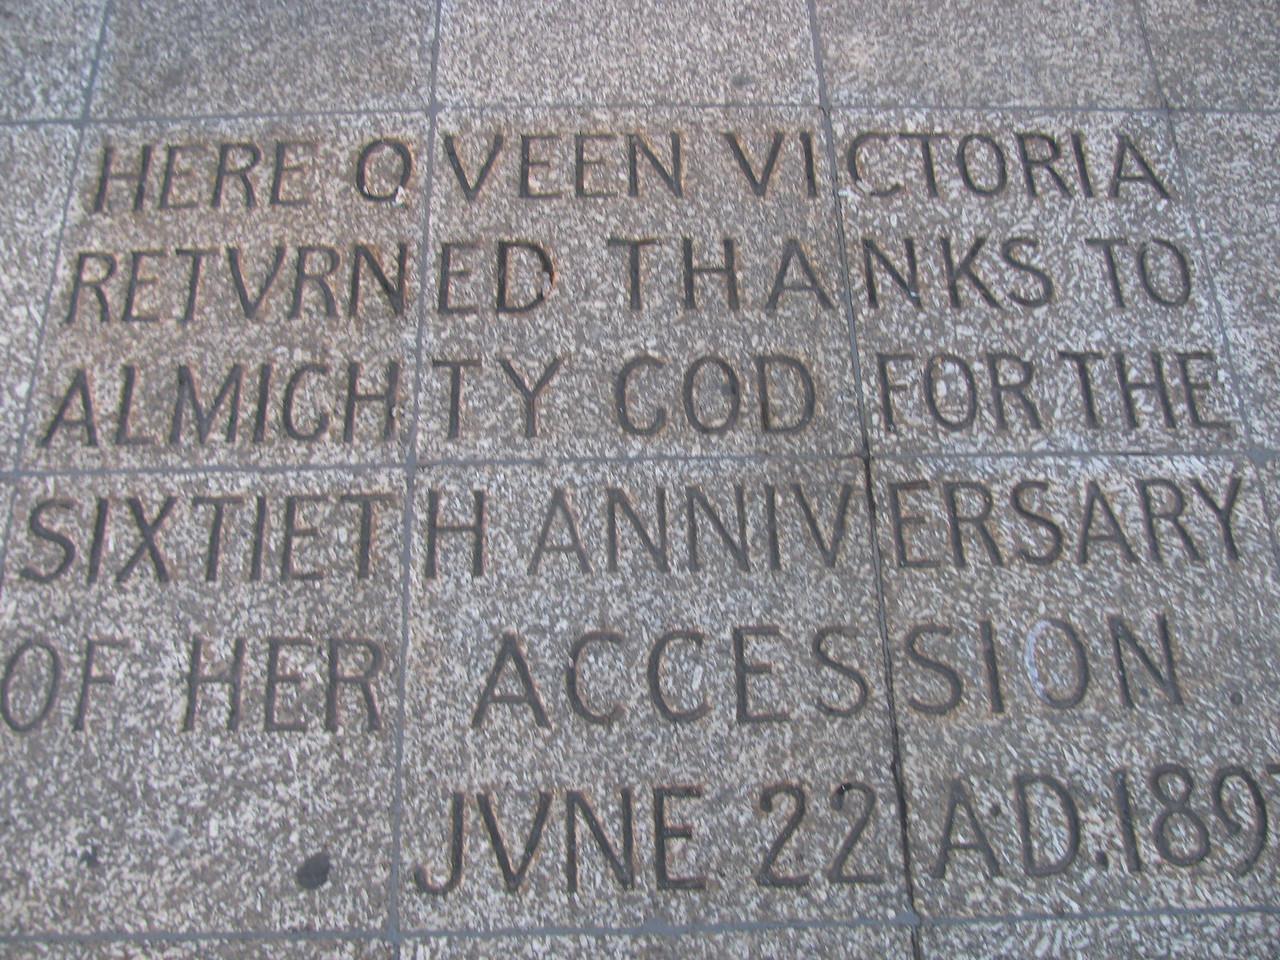 Inscription @ St Pauls